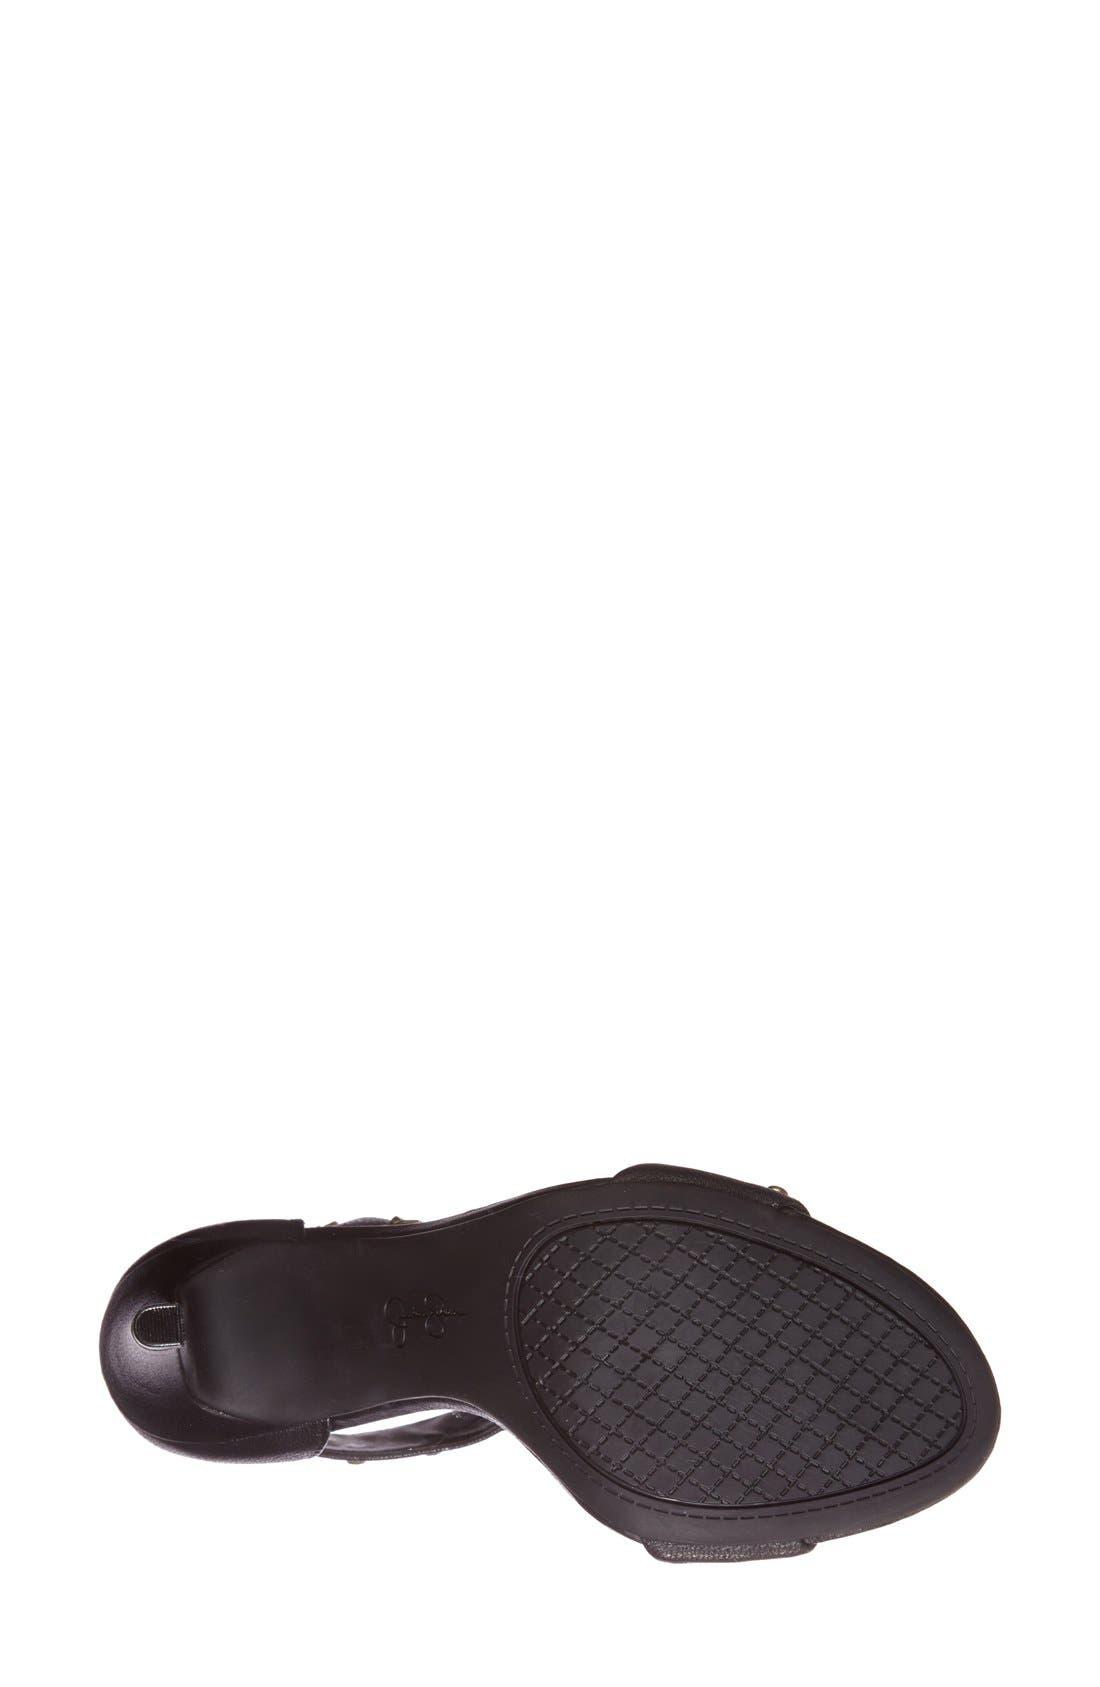 'Elonna' Studded Ankle Cuff Sandal,                             Alternate thumbnail 2, color,                             001